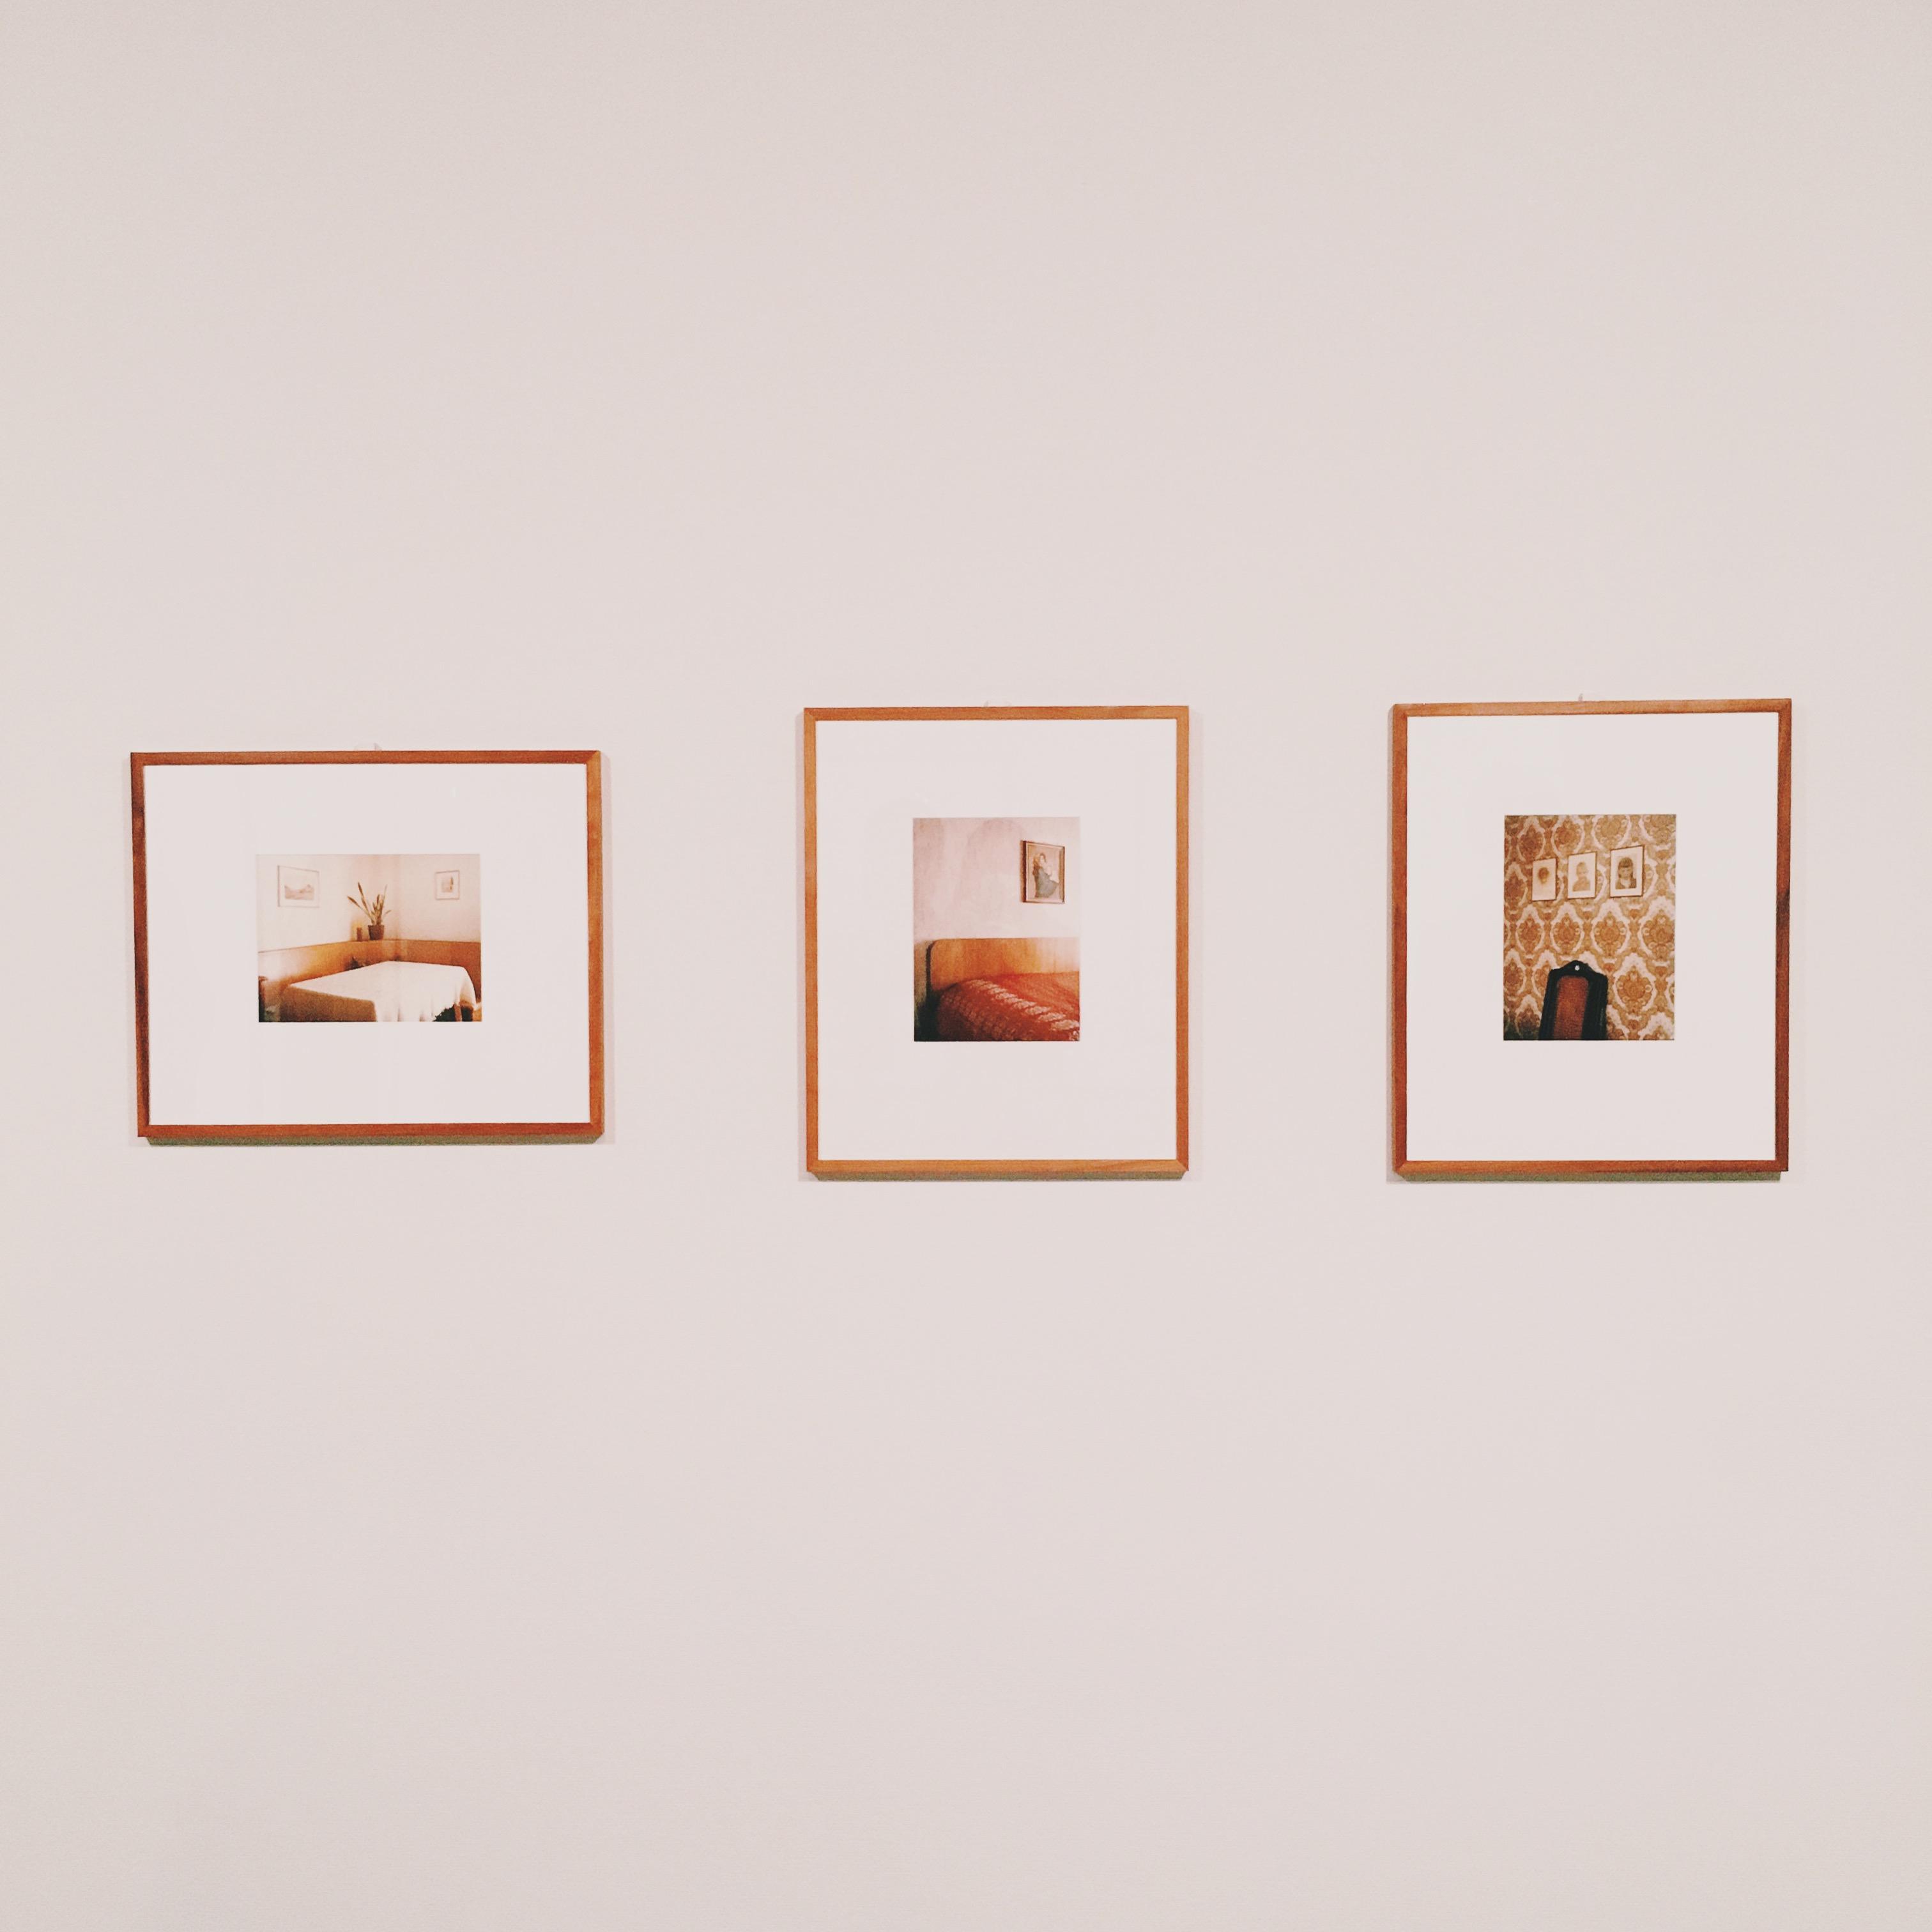 「Interieurs」(1979-1983) Thomas Ruff